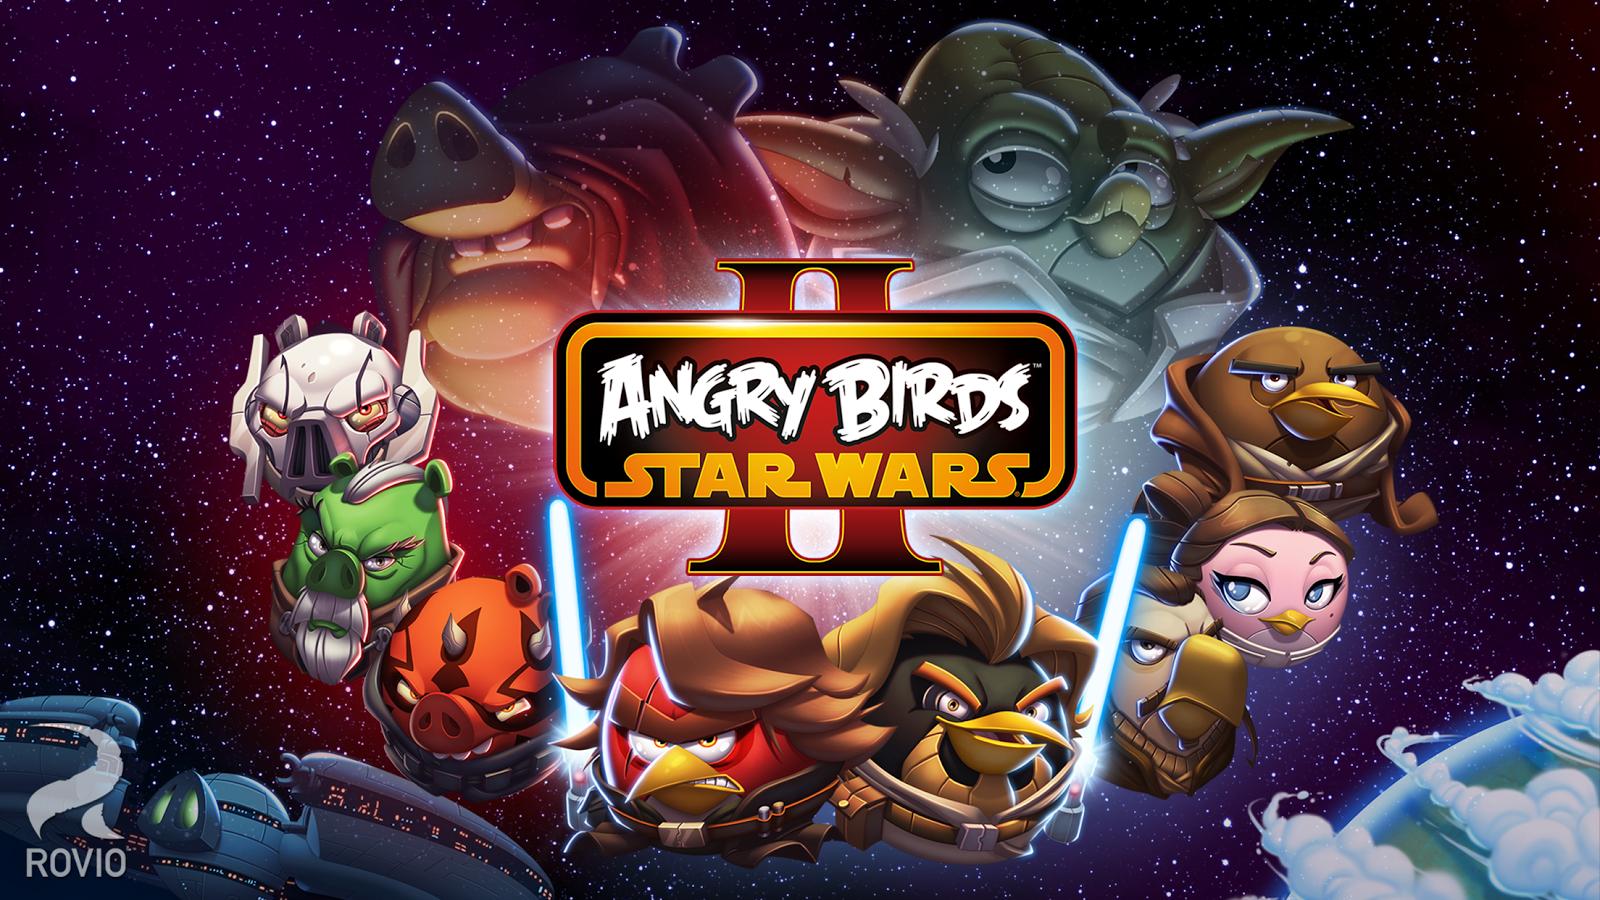 Angry birds star wars 2 для windows 10 mobile и windows phone.